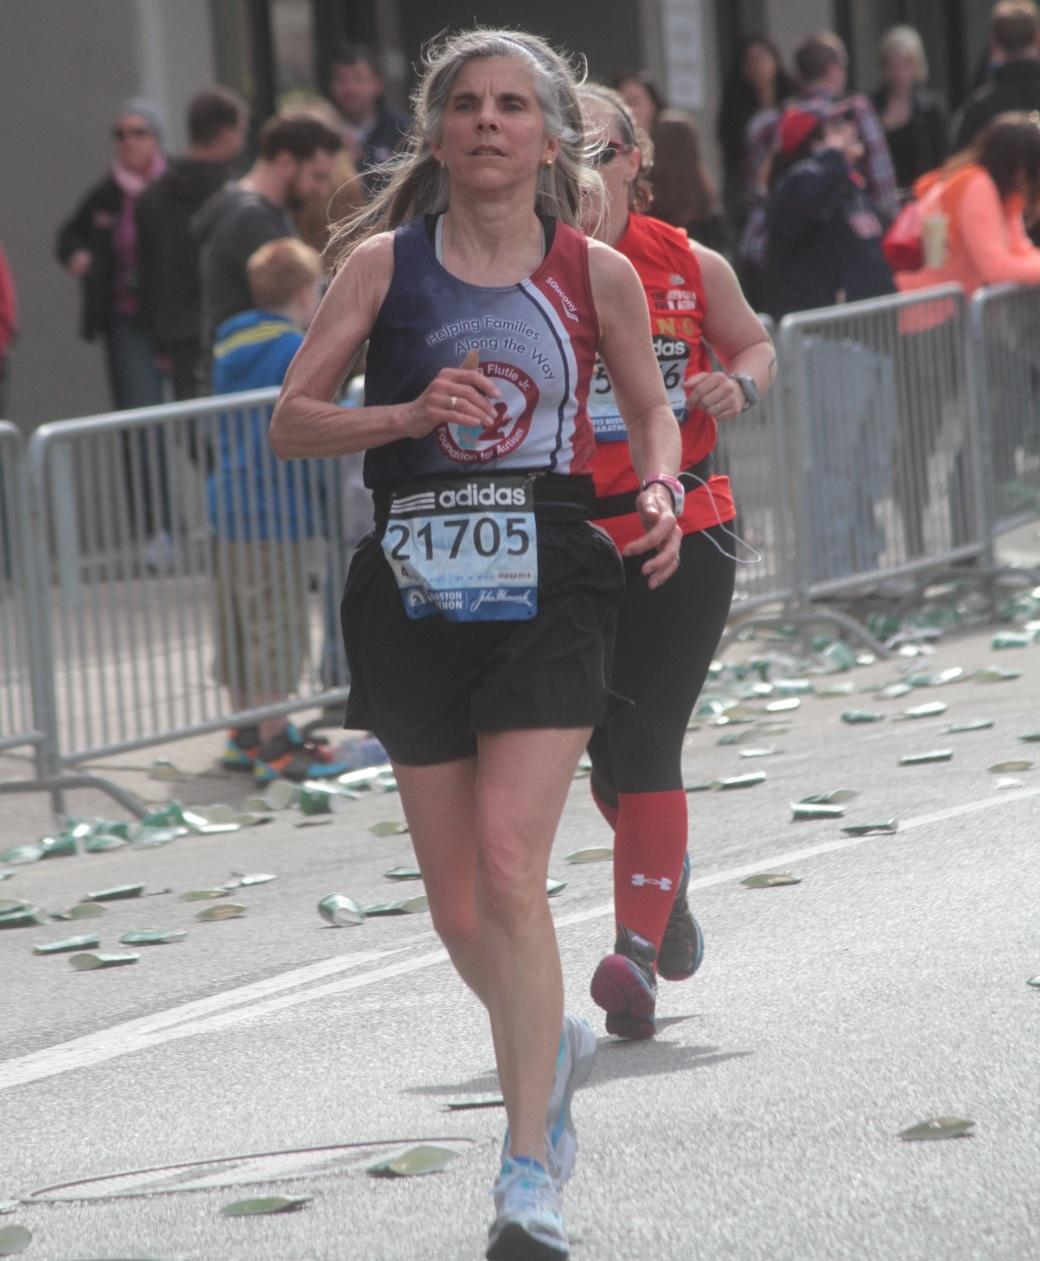 boston marathon 2013 number 21705